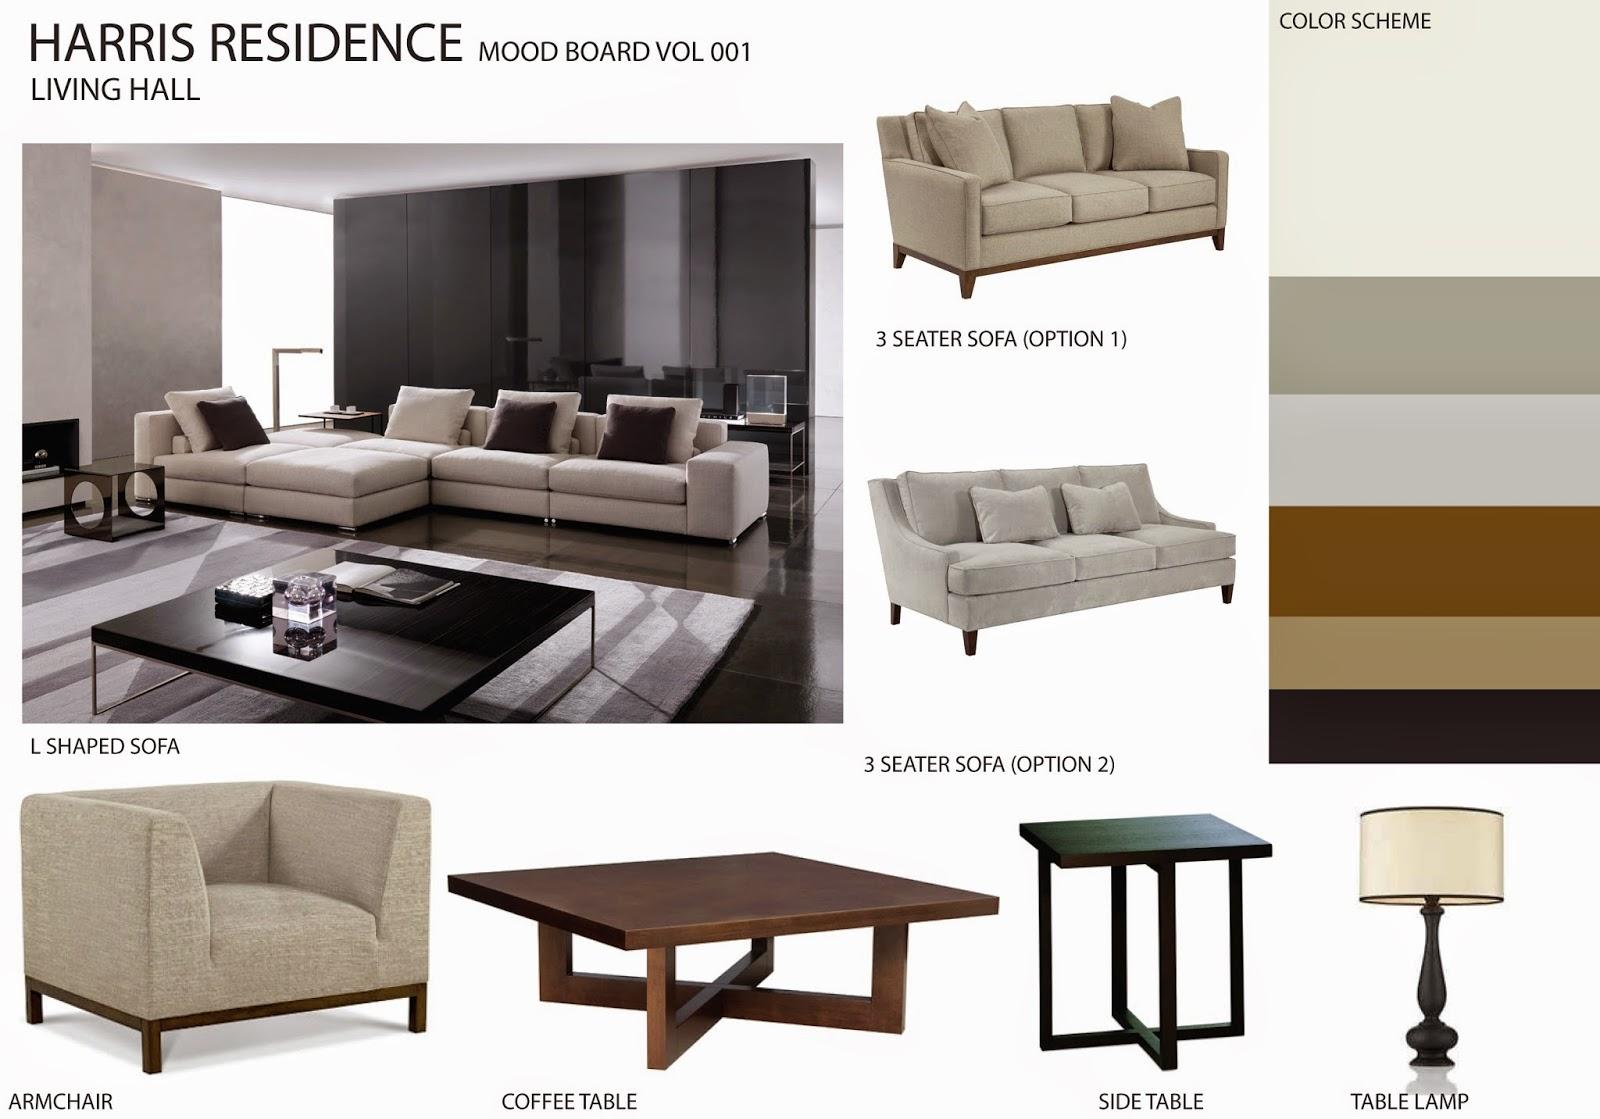 Sarang Interiors Modern Tropical Interior Design By: SARANG INTERIORS: SARANG INTERIORS PROJECT: LUXURY PRIVATE